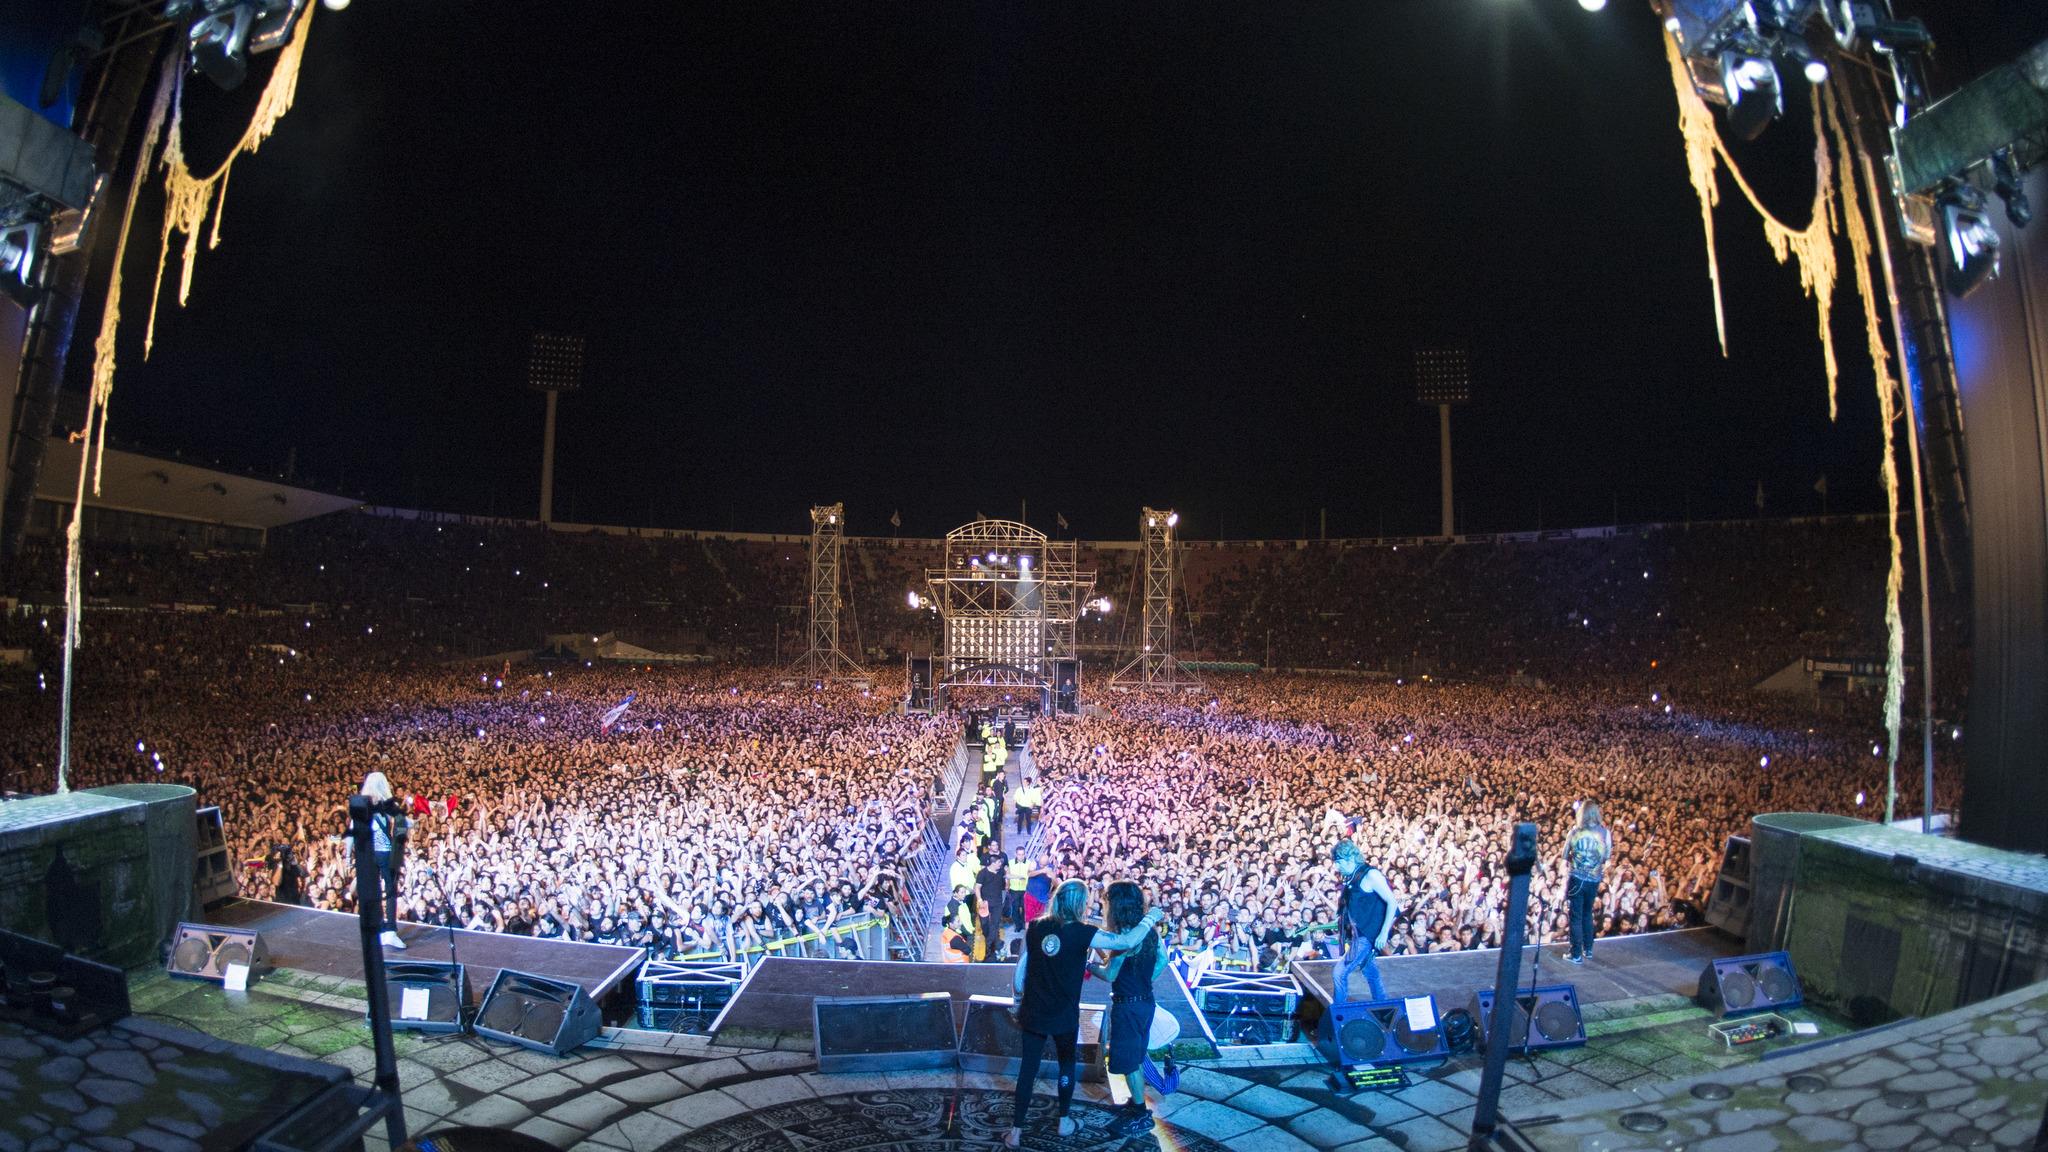 Iron Maiden: Legacy Of The Beast Tour 2019